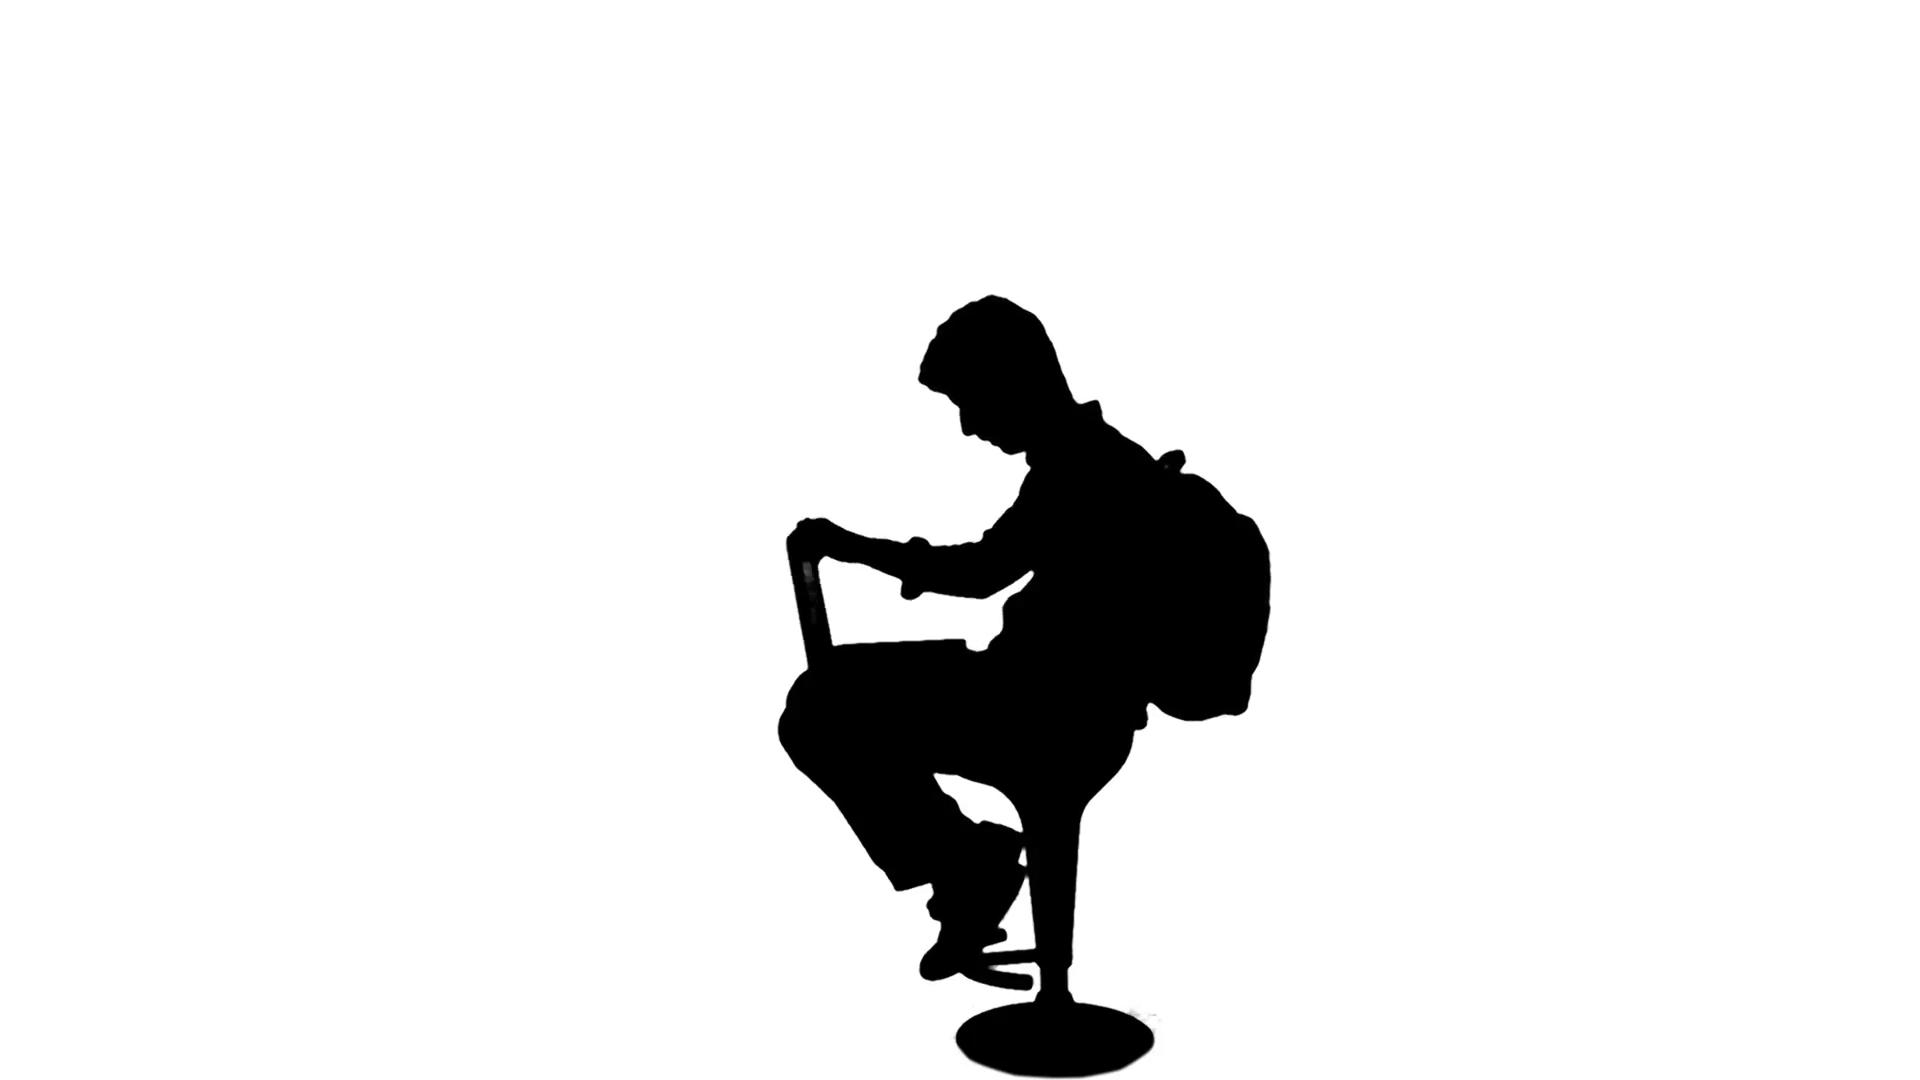 1920x1080 University Student Work Laptop Silhouette